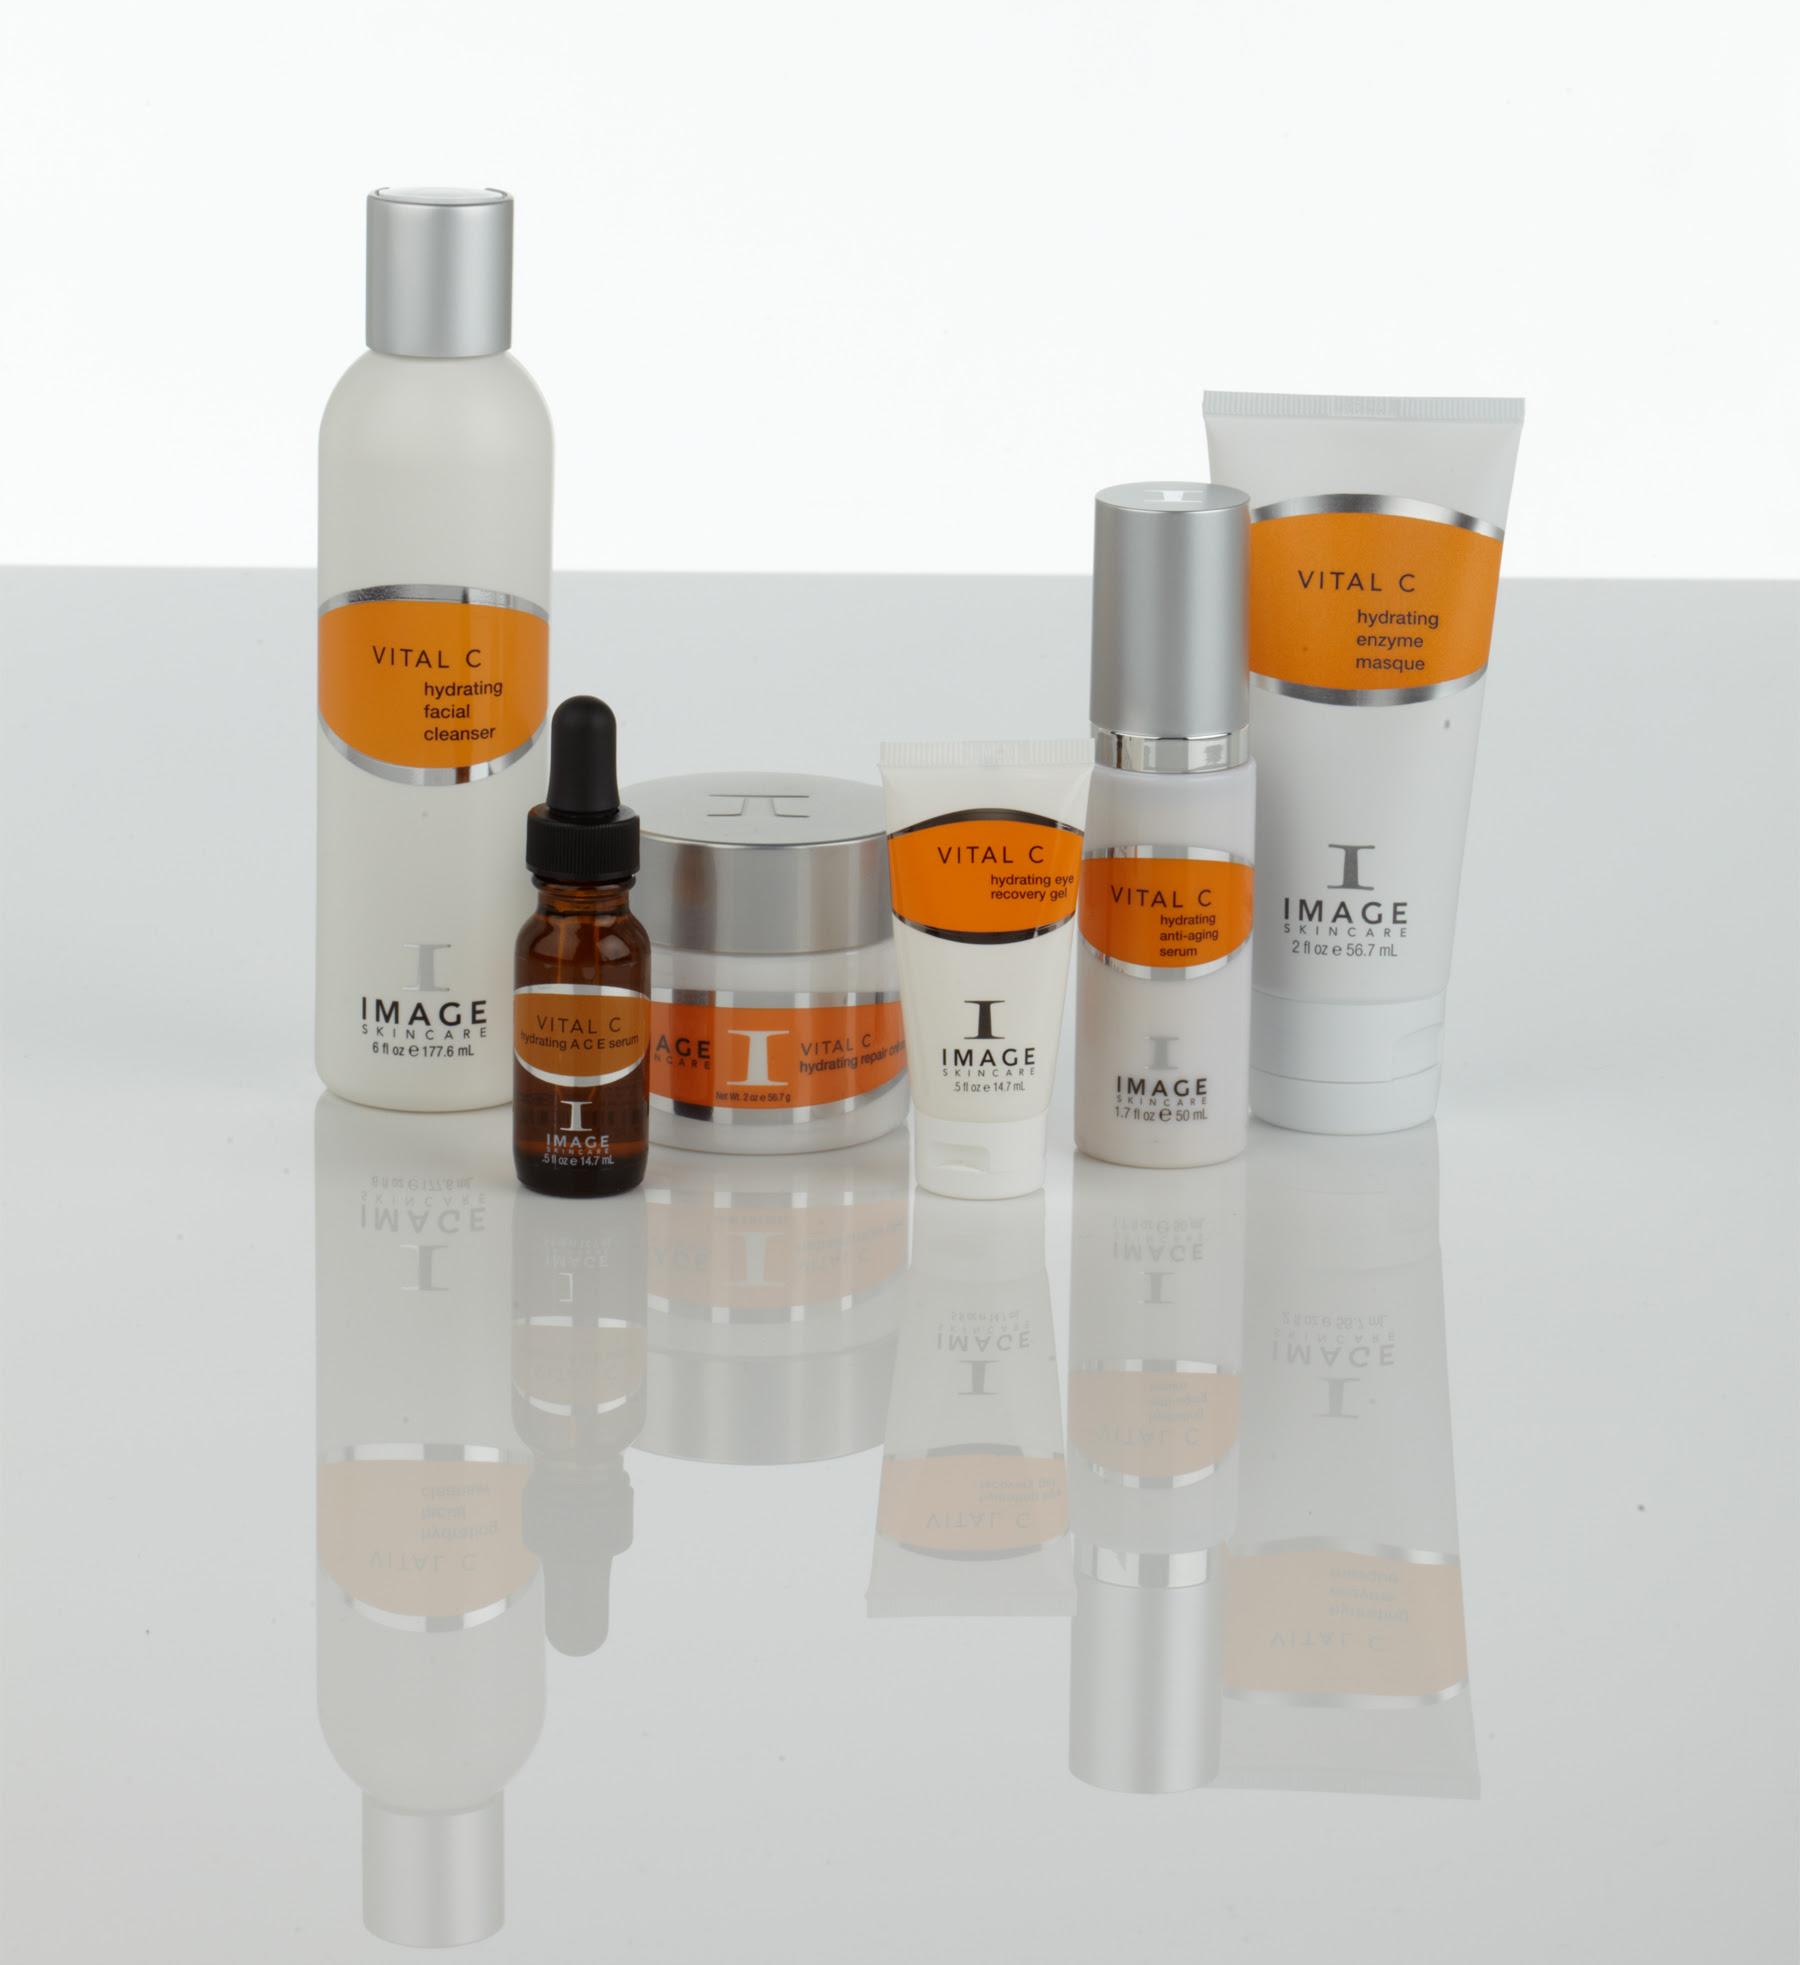 Image Skincare Available At Emilaine Skincare Studio